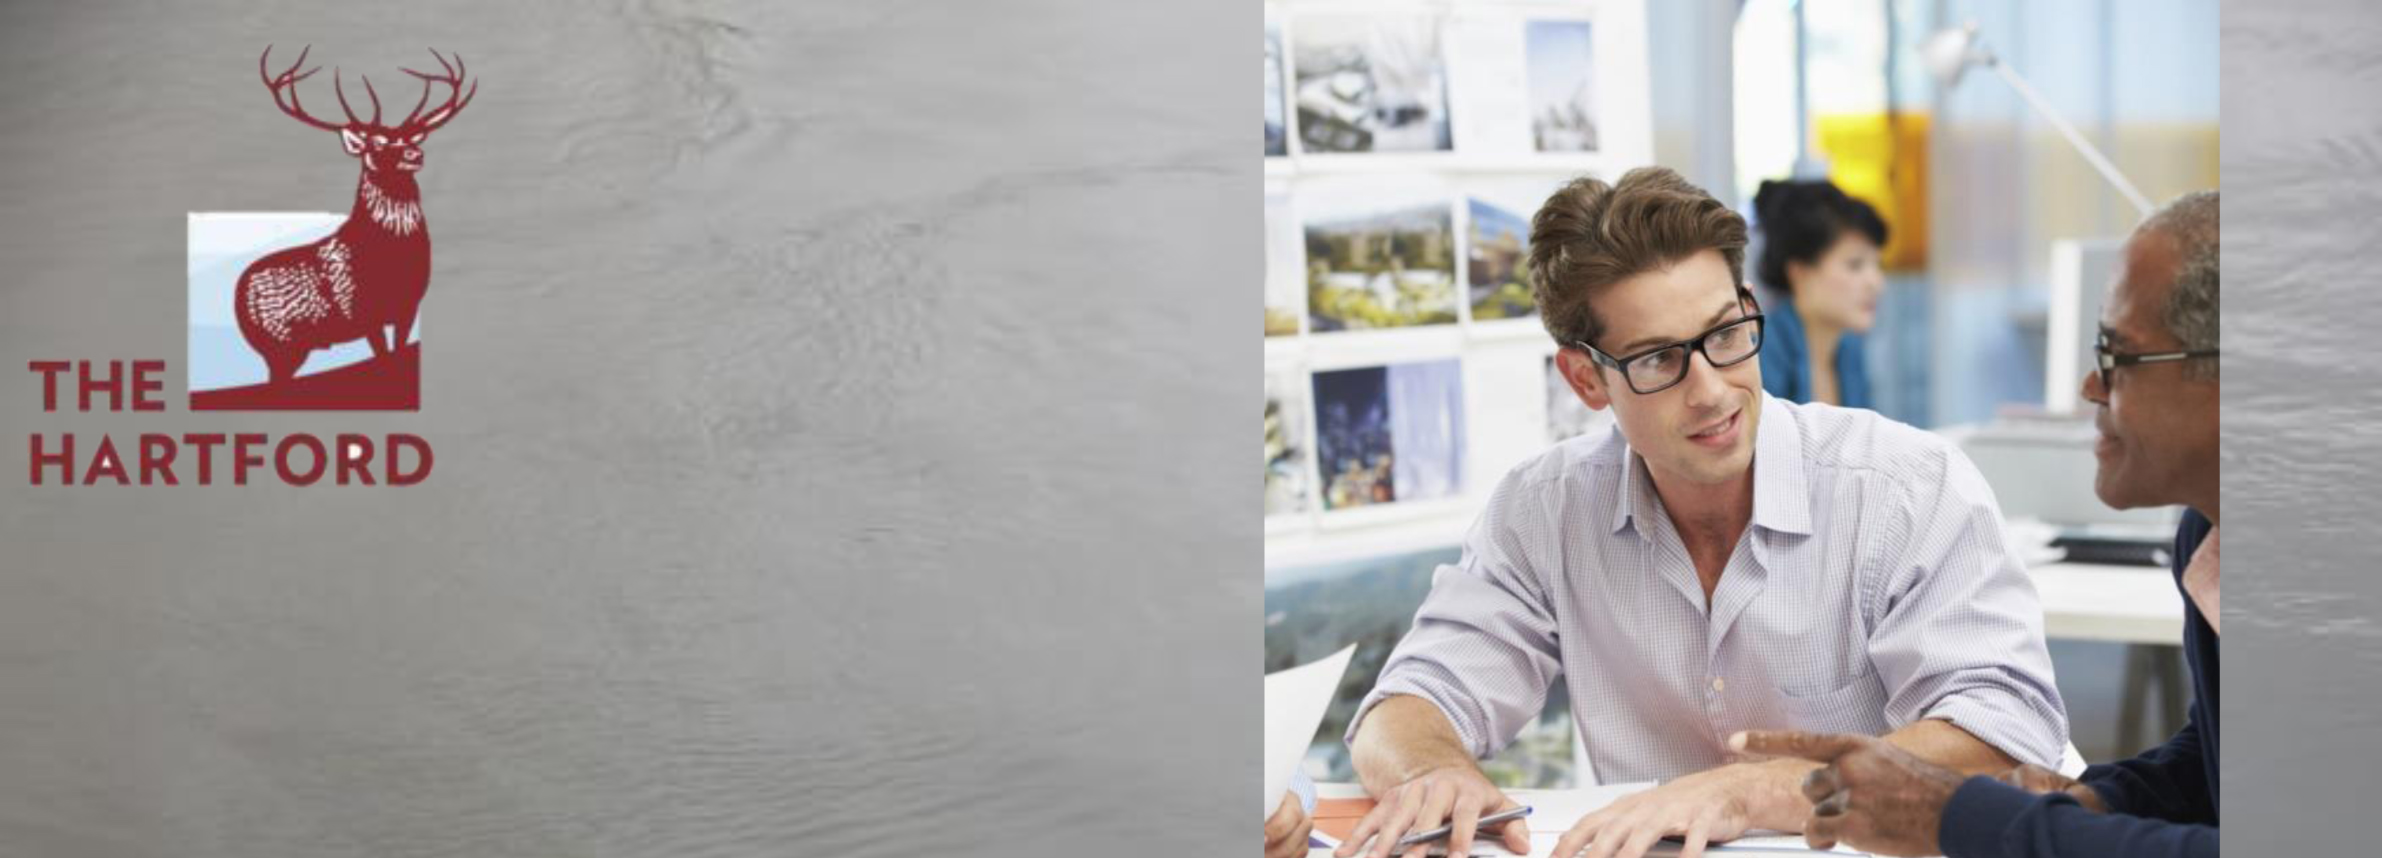 Hartford Flood Insurance >> Flood Insurance Sales With Hartford Professional Insurance